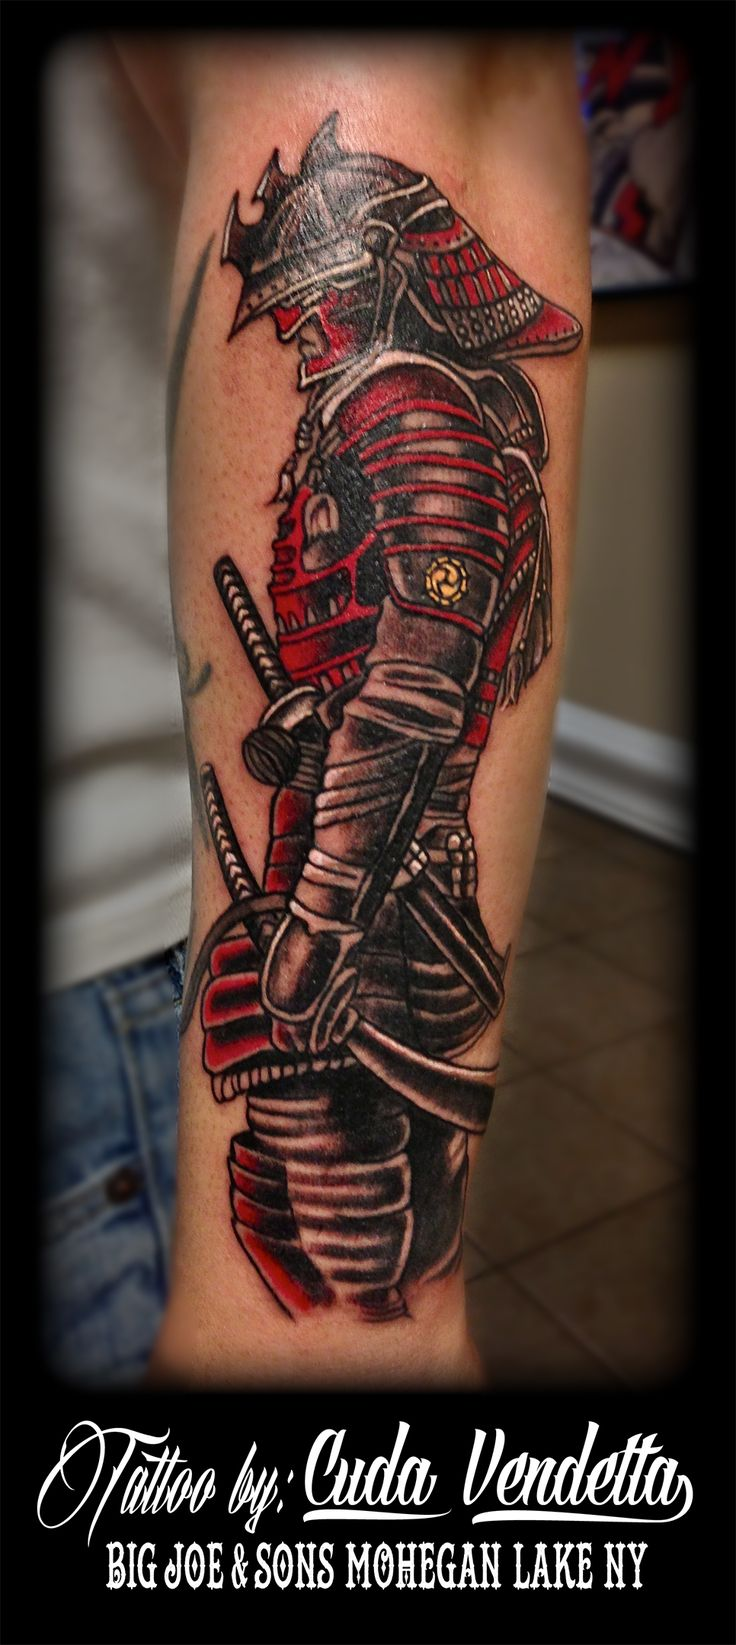 Tattoo ideas for men names nguyên gia nguyengiapao on pinterest